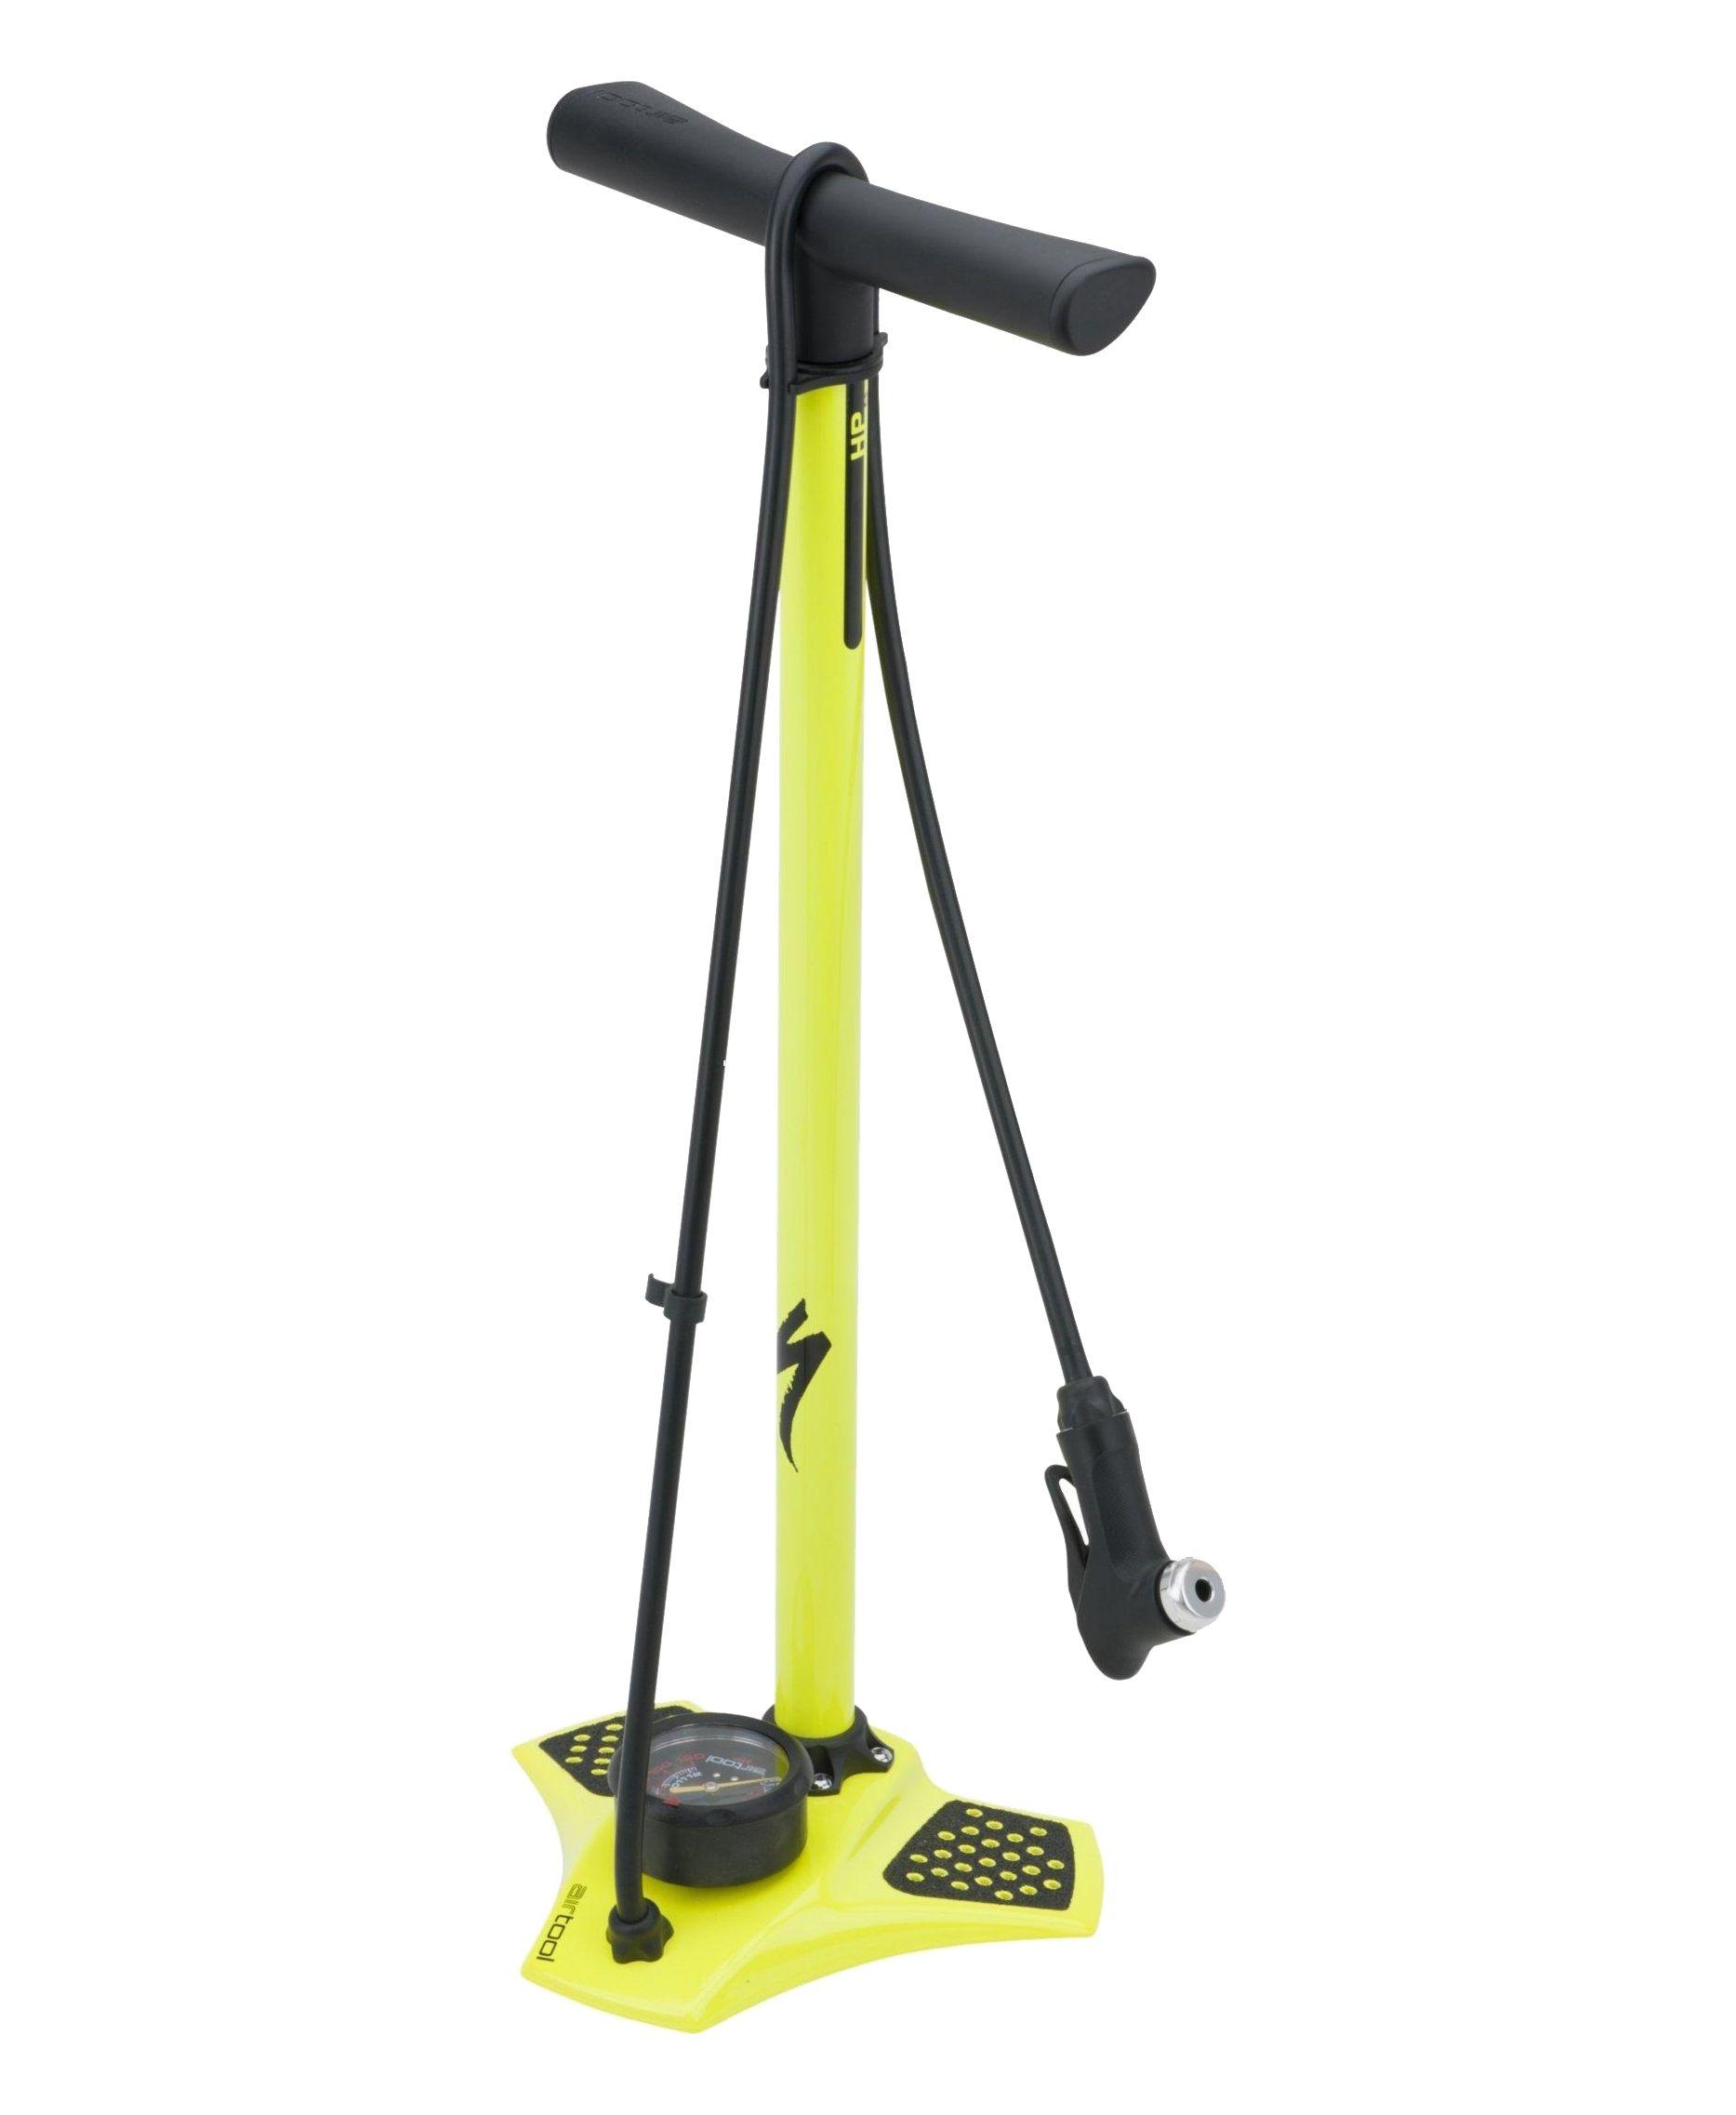 Specialized Air Tool Hp Floor Pump | Fodpumper